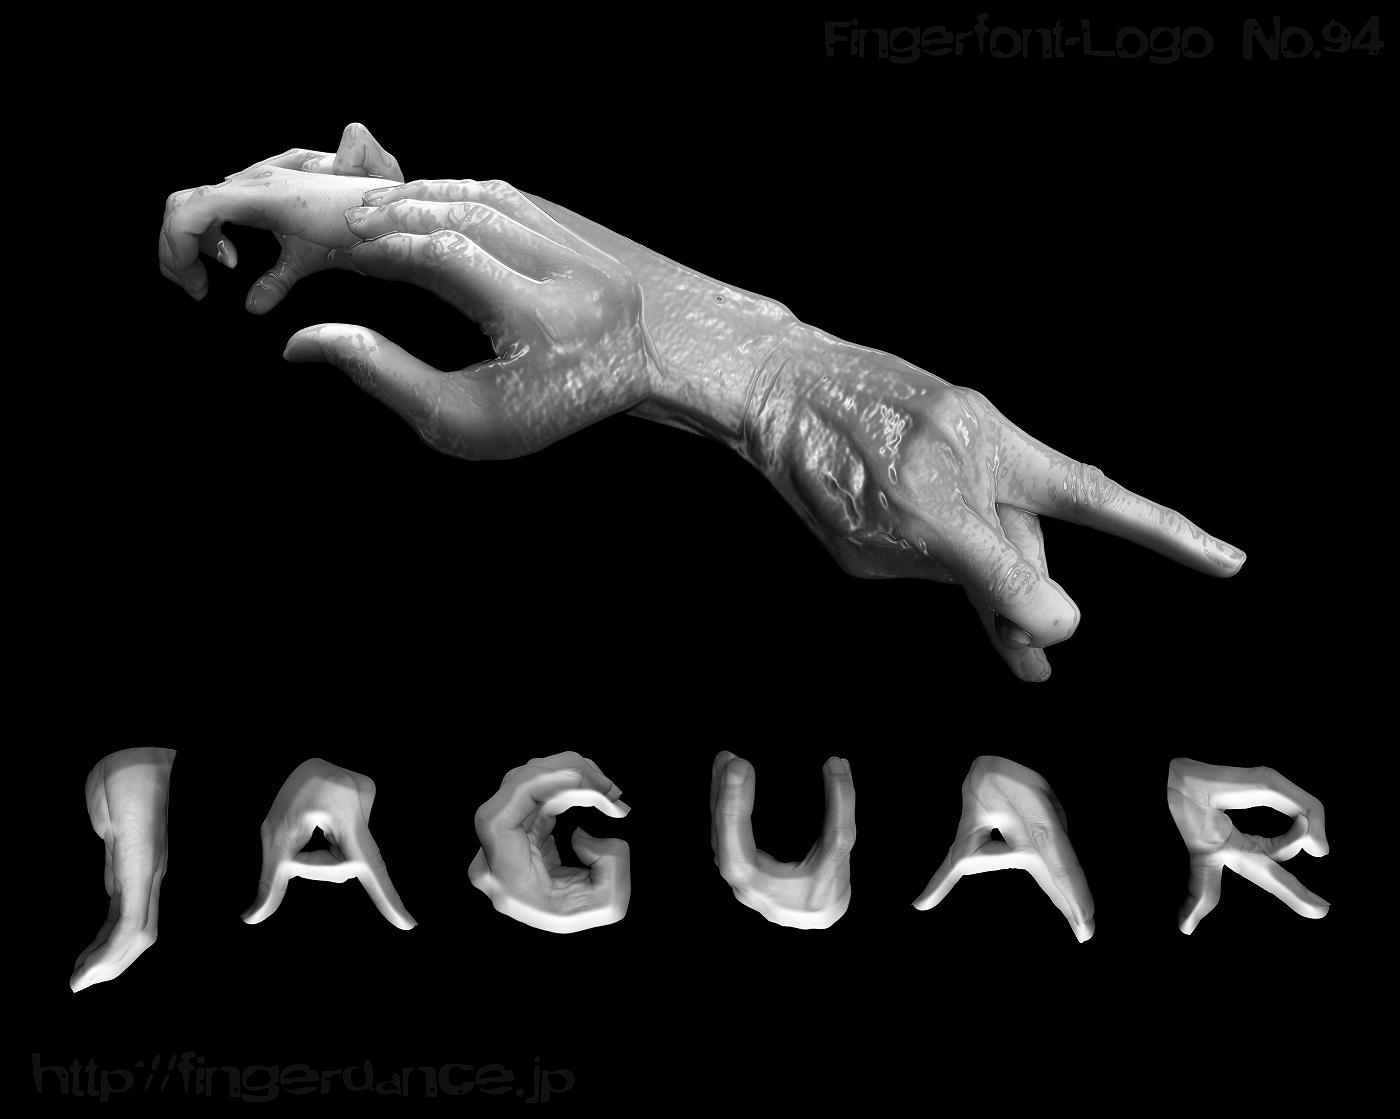 Jagar-fingerhttp://fingerdance.jp/L/logohand ジャガー・フィンガーロゴハンド手指